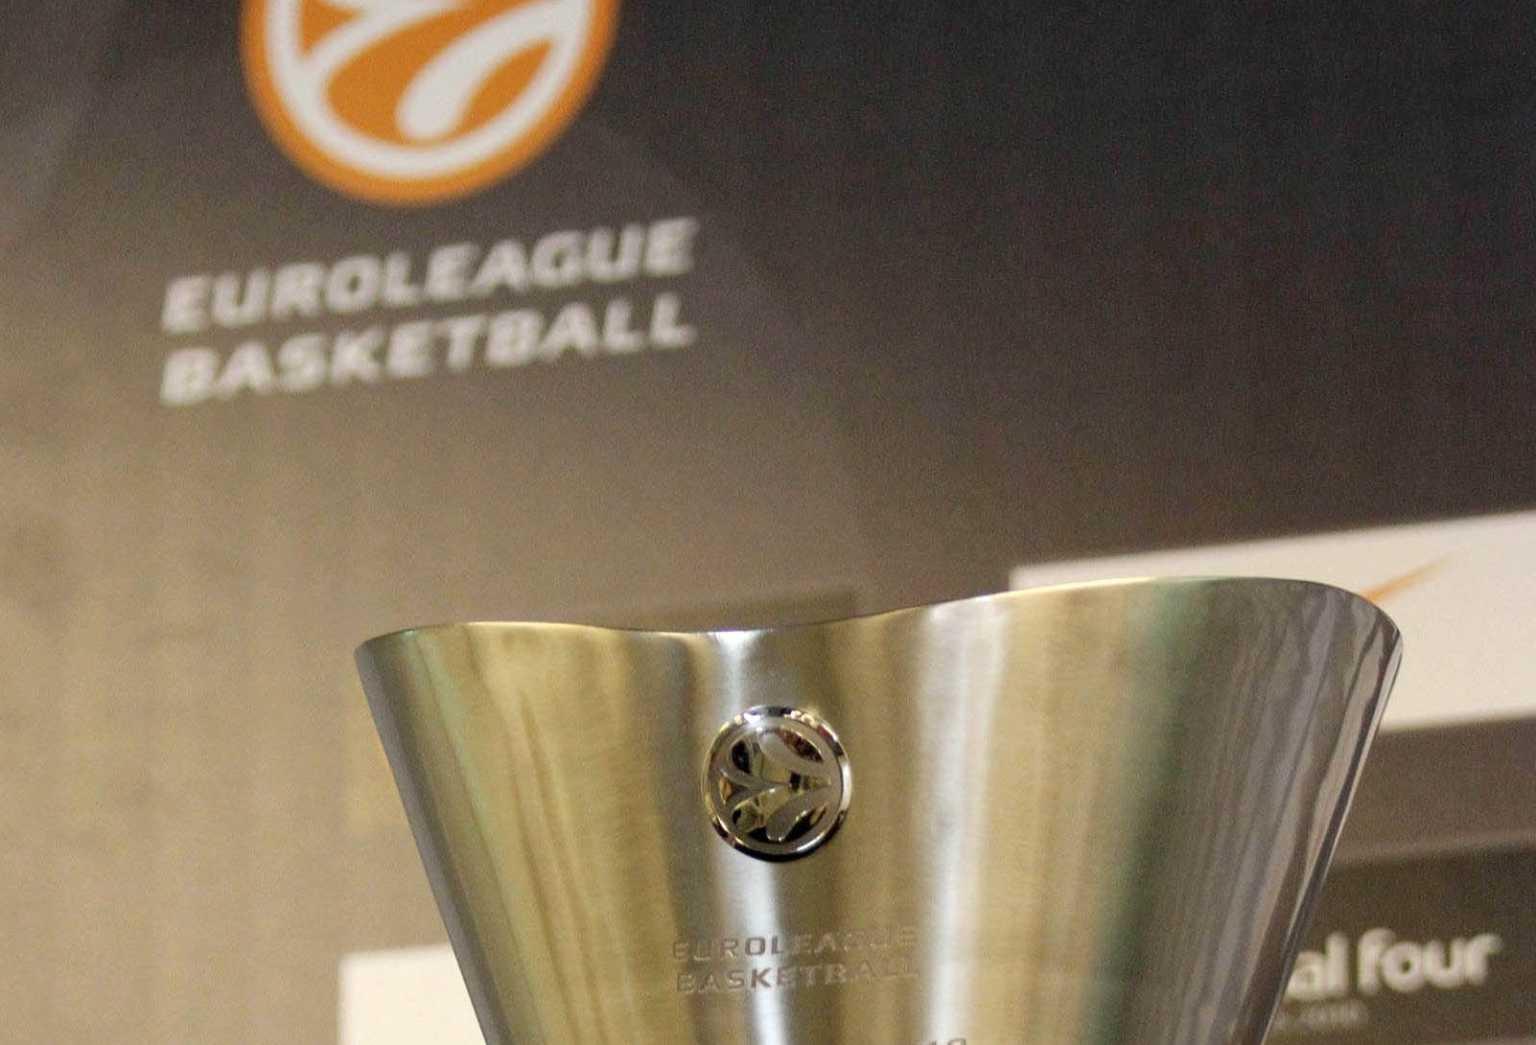 Euroleague: Αυτές είναι οι ομάδες και το πρόγραμμα του Final-4 της Κολωνίας